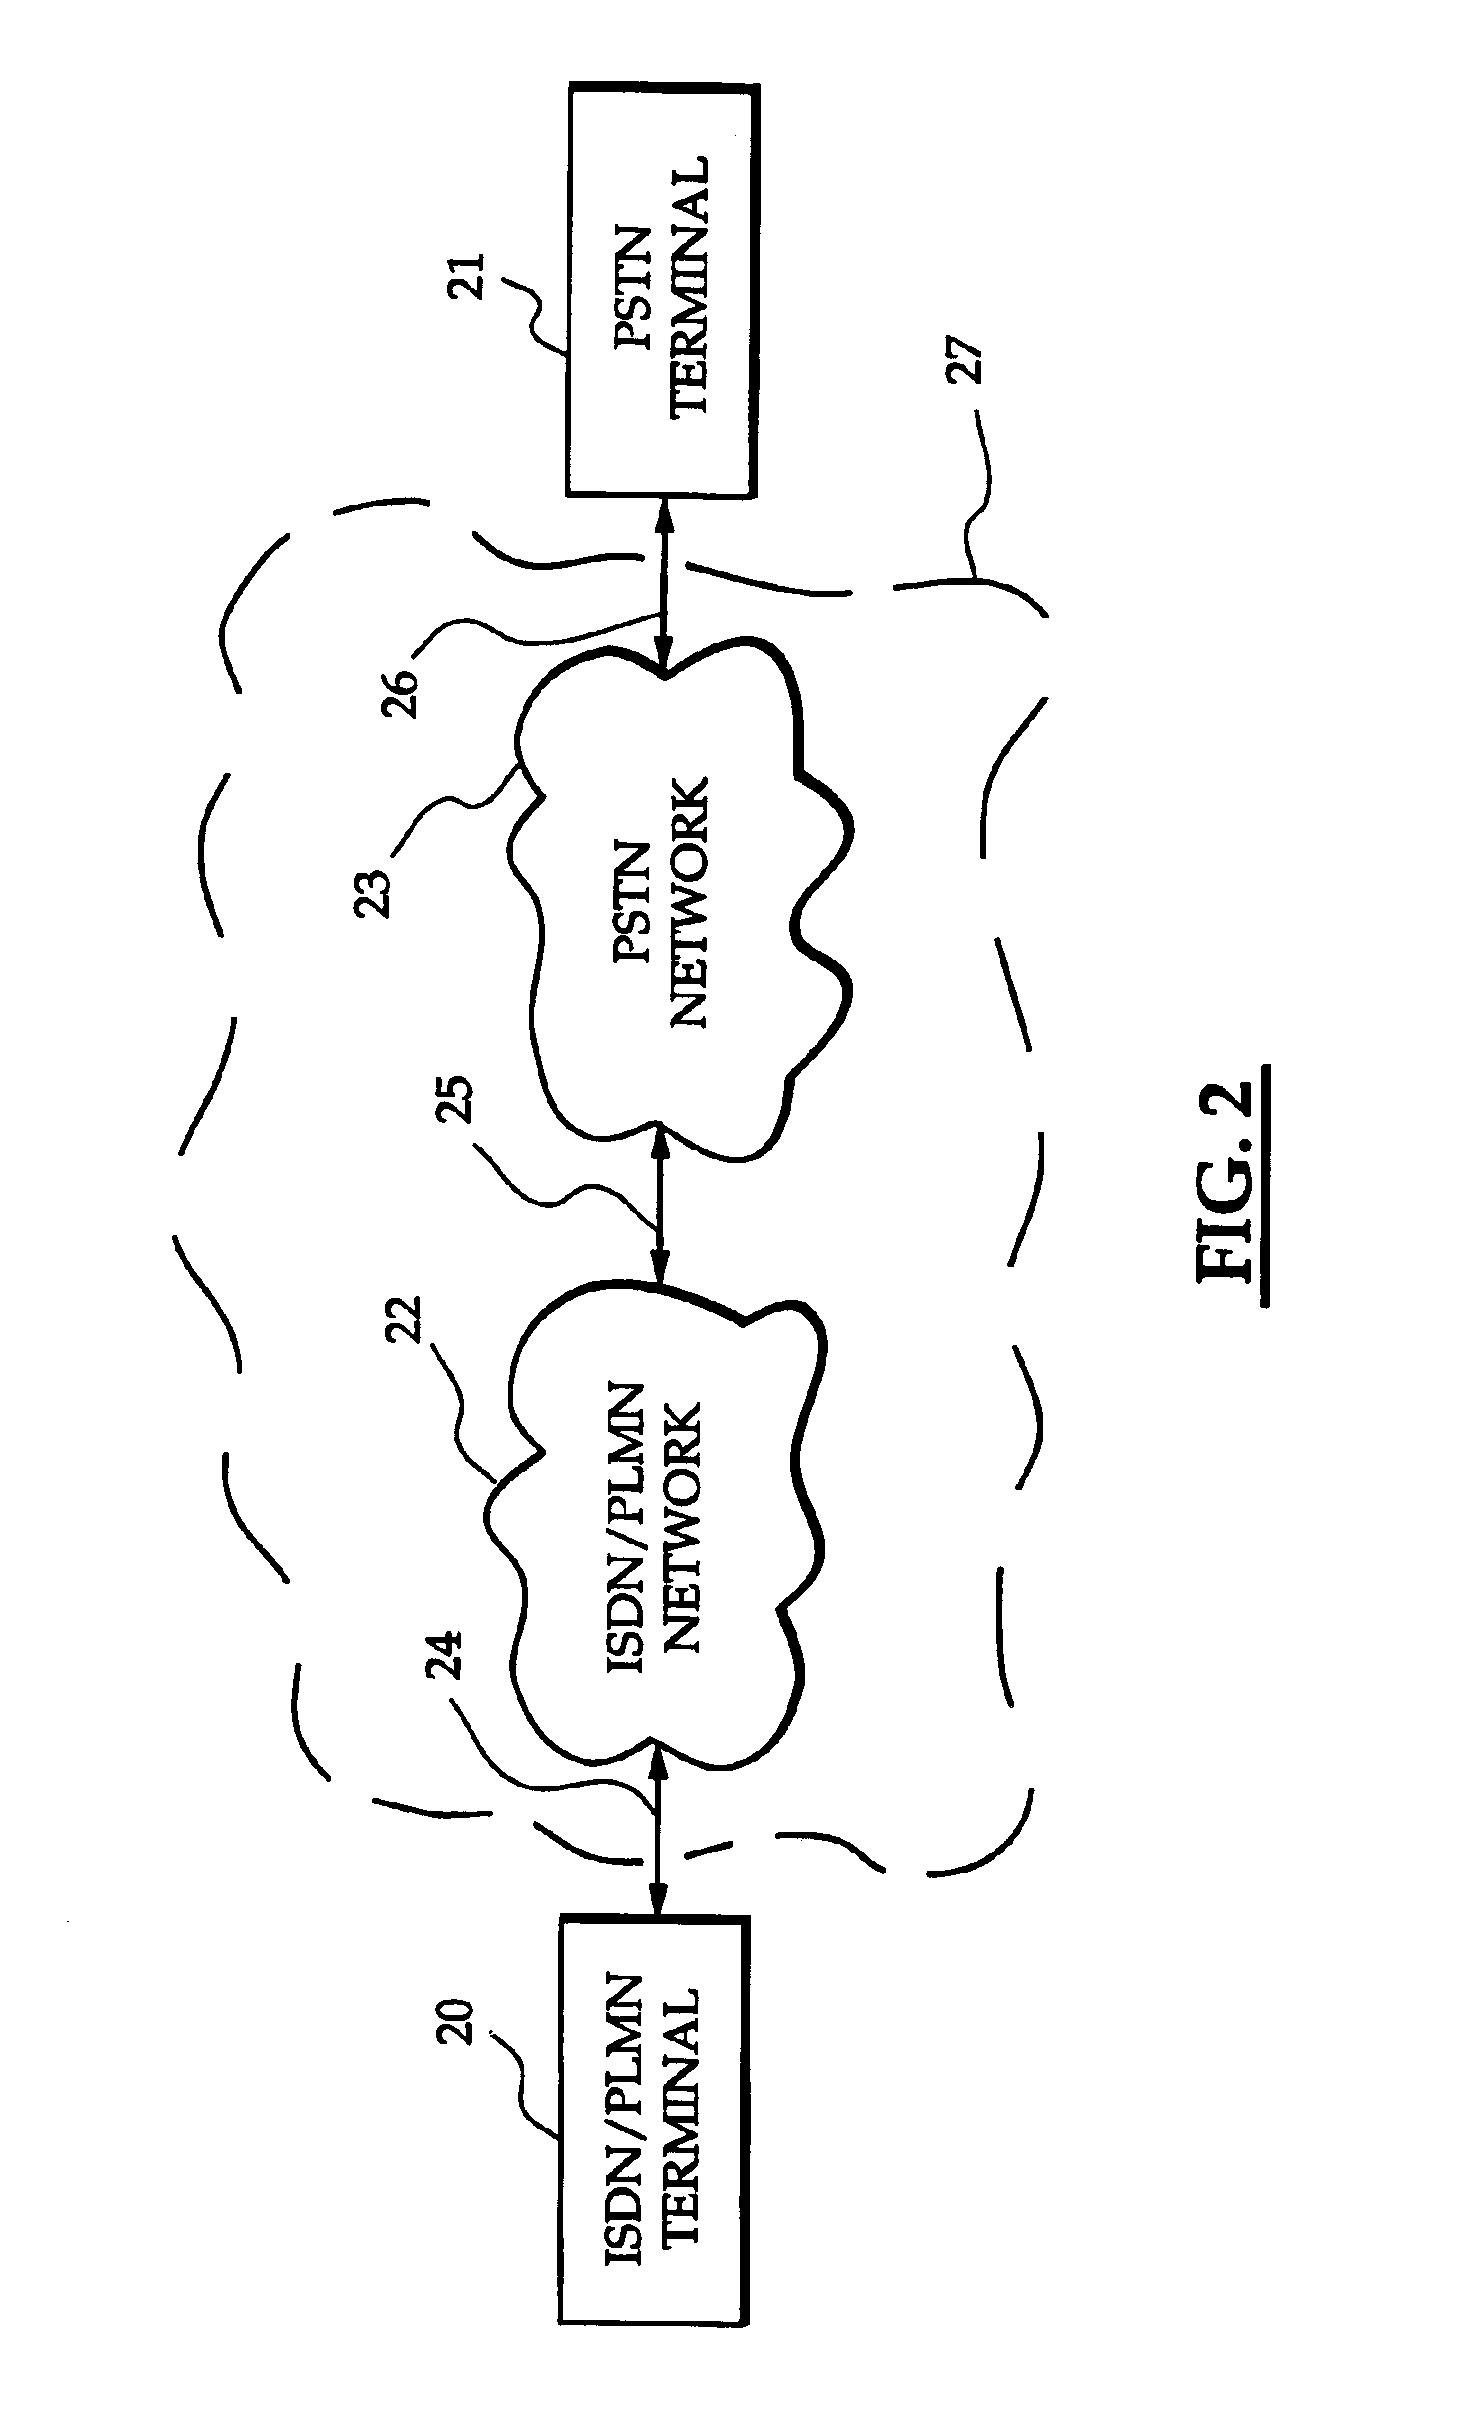 Call Center Network | Wiring Diagram Database